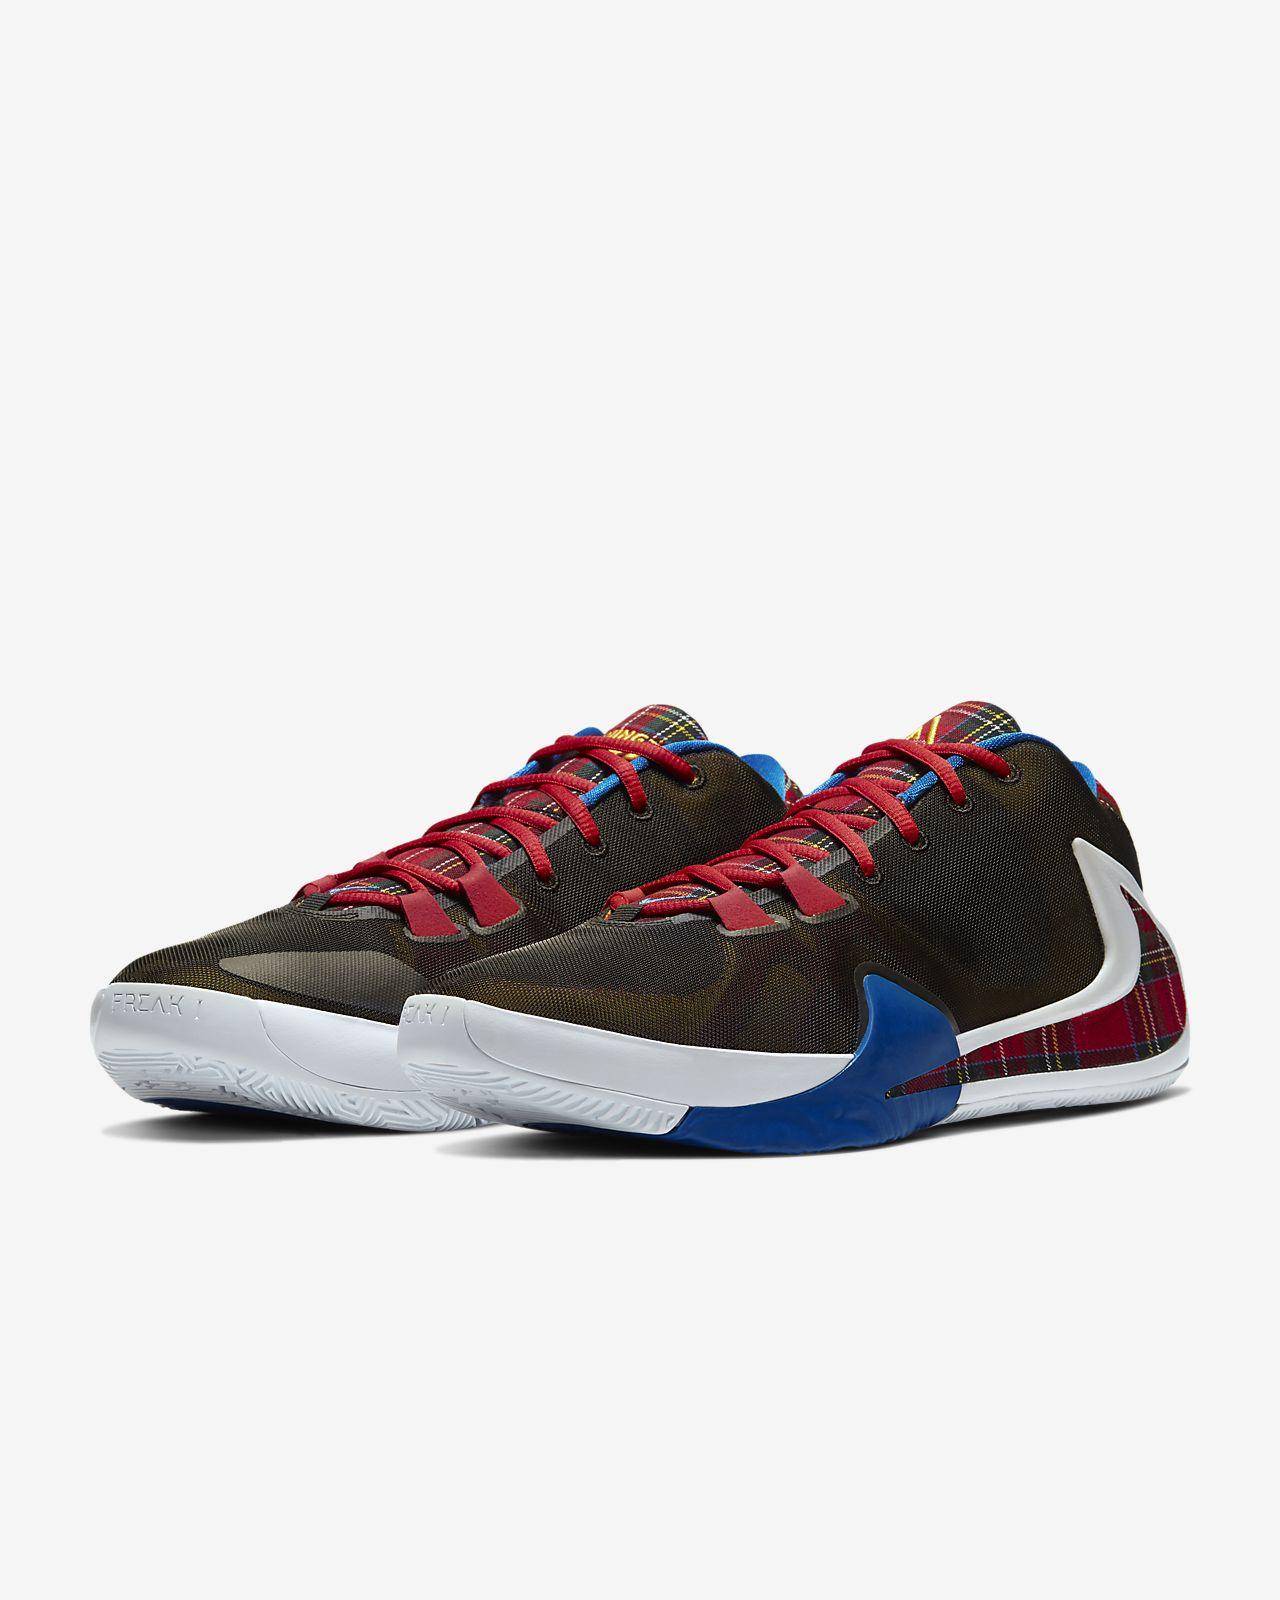 Nike Zoom Freak 1 Employee of the Month CD4962 001 Release